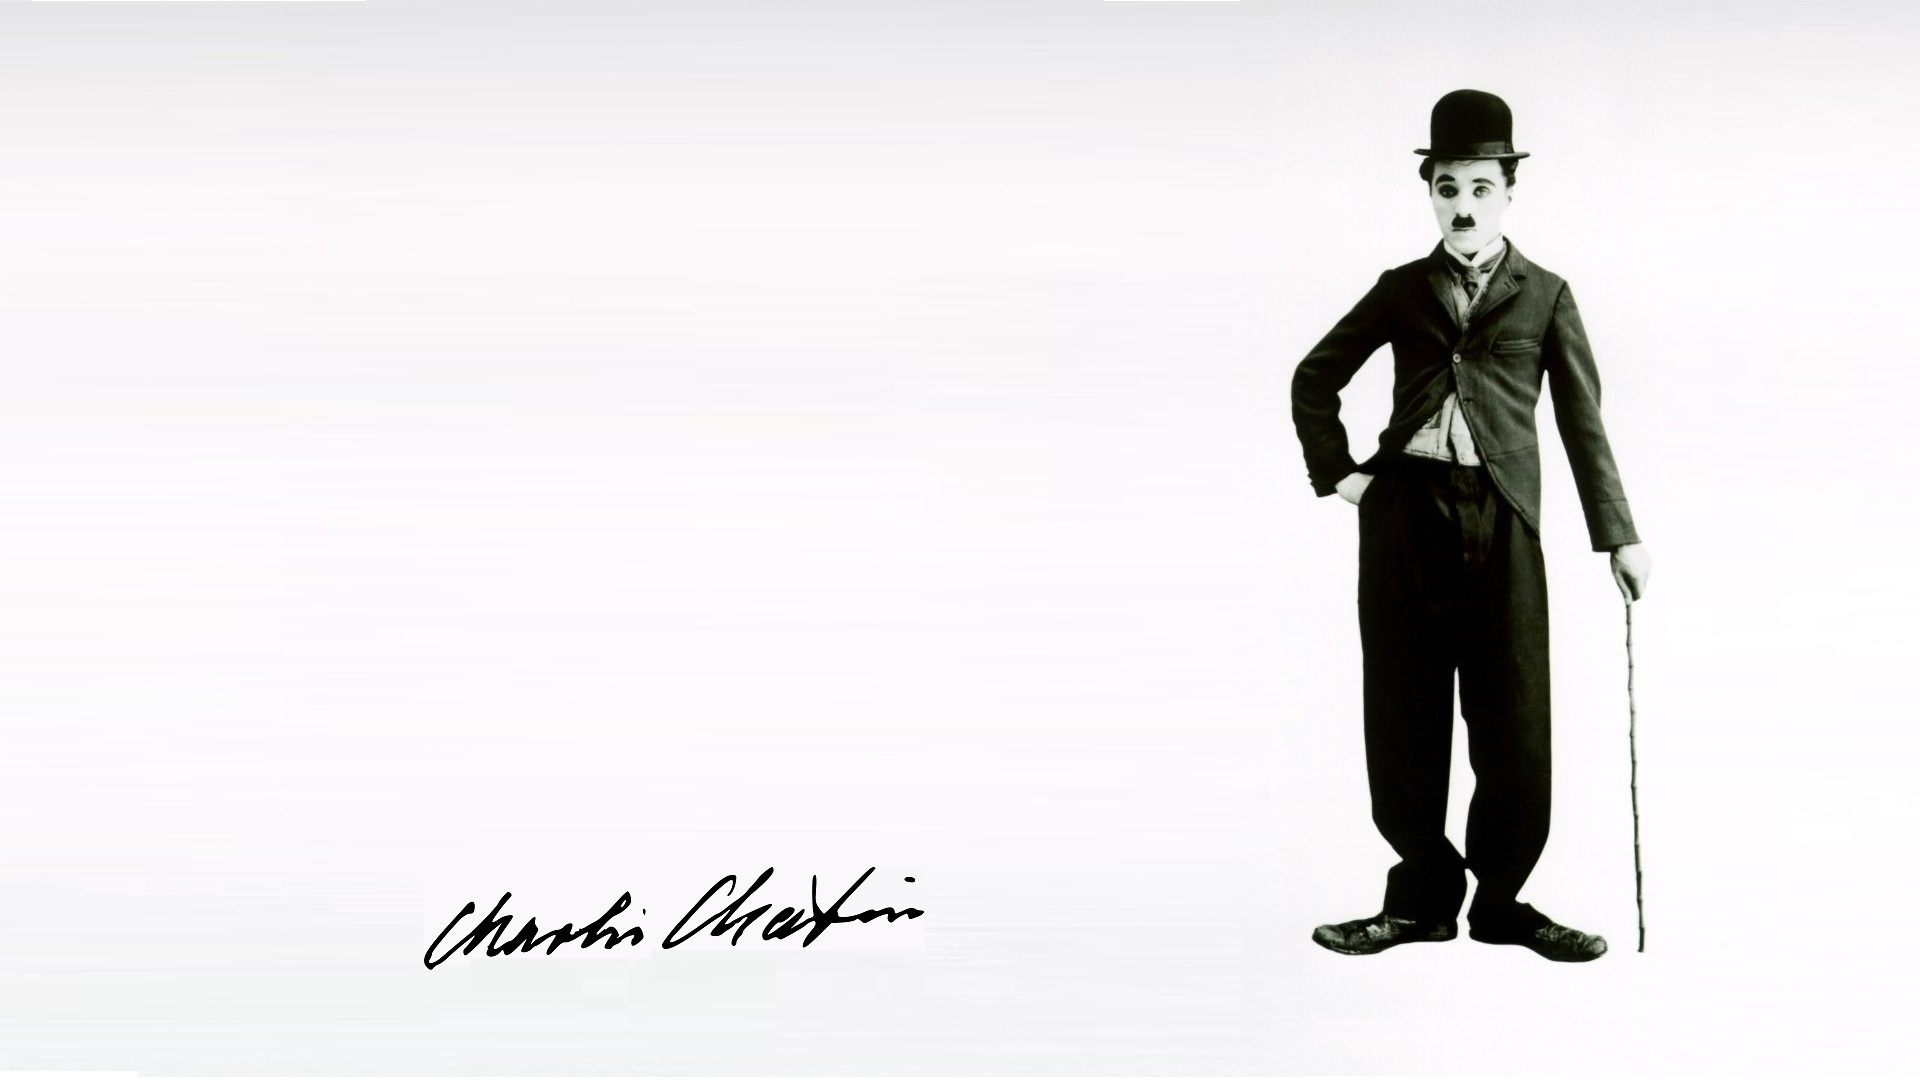 Charlie Chaplin Wallpapers HD Download 1920x1080